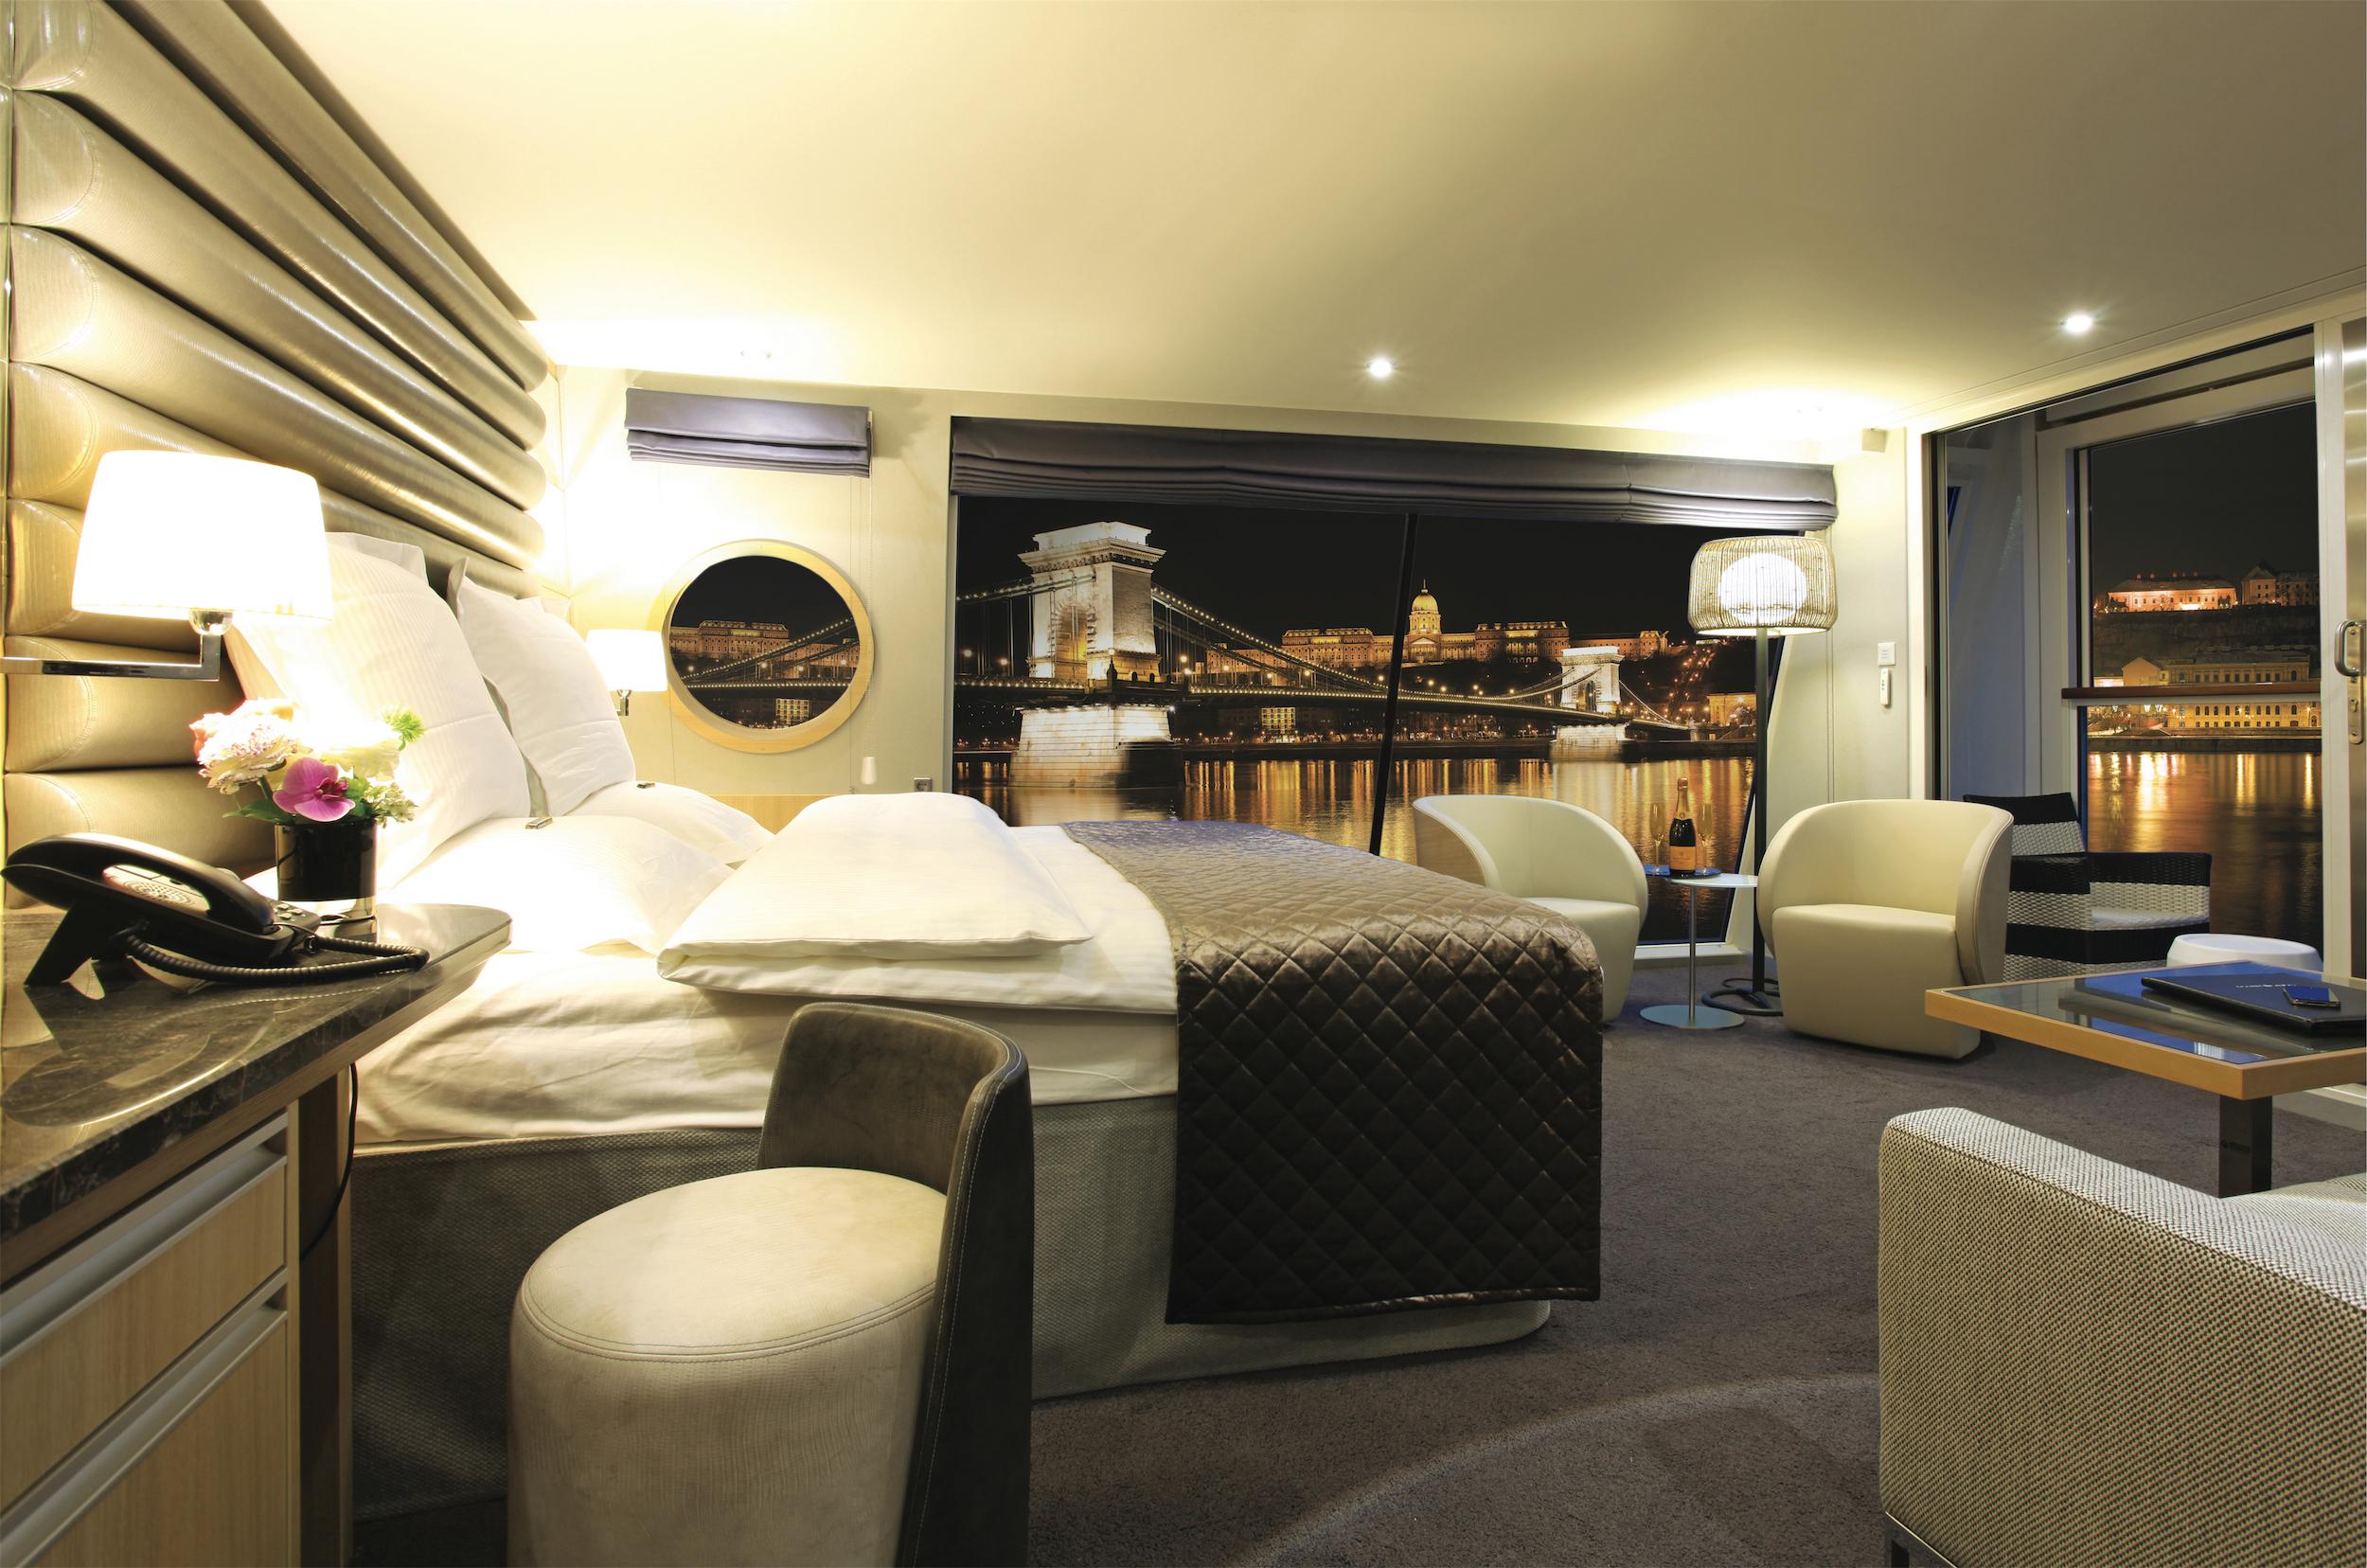 Scenic Crystal Scenic Jewel Scenic Jade Accommodation Royal Panorama Suite.jpg